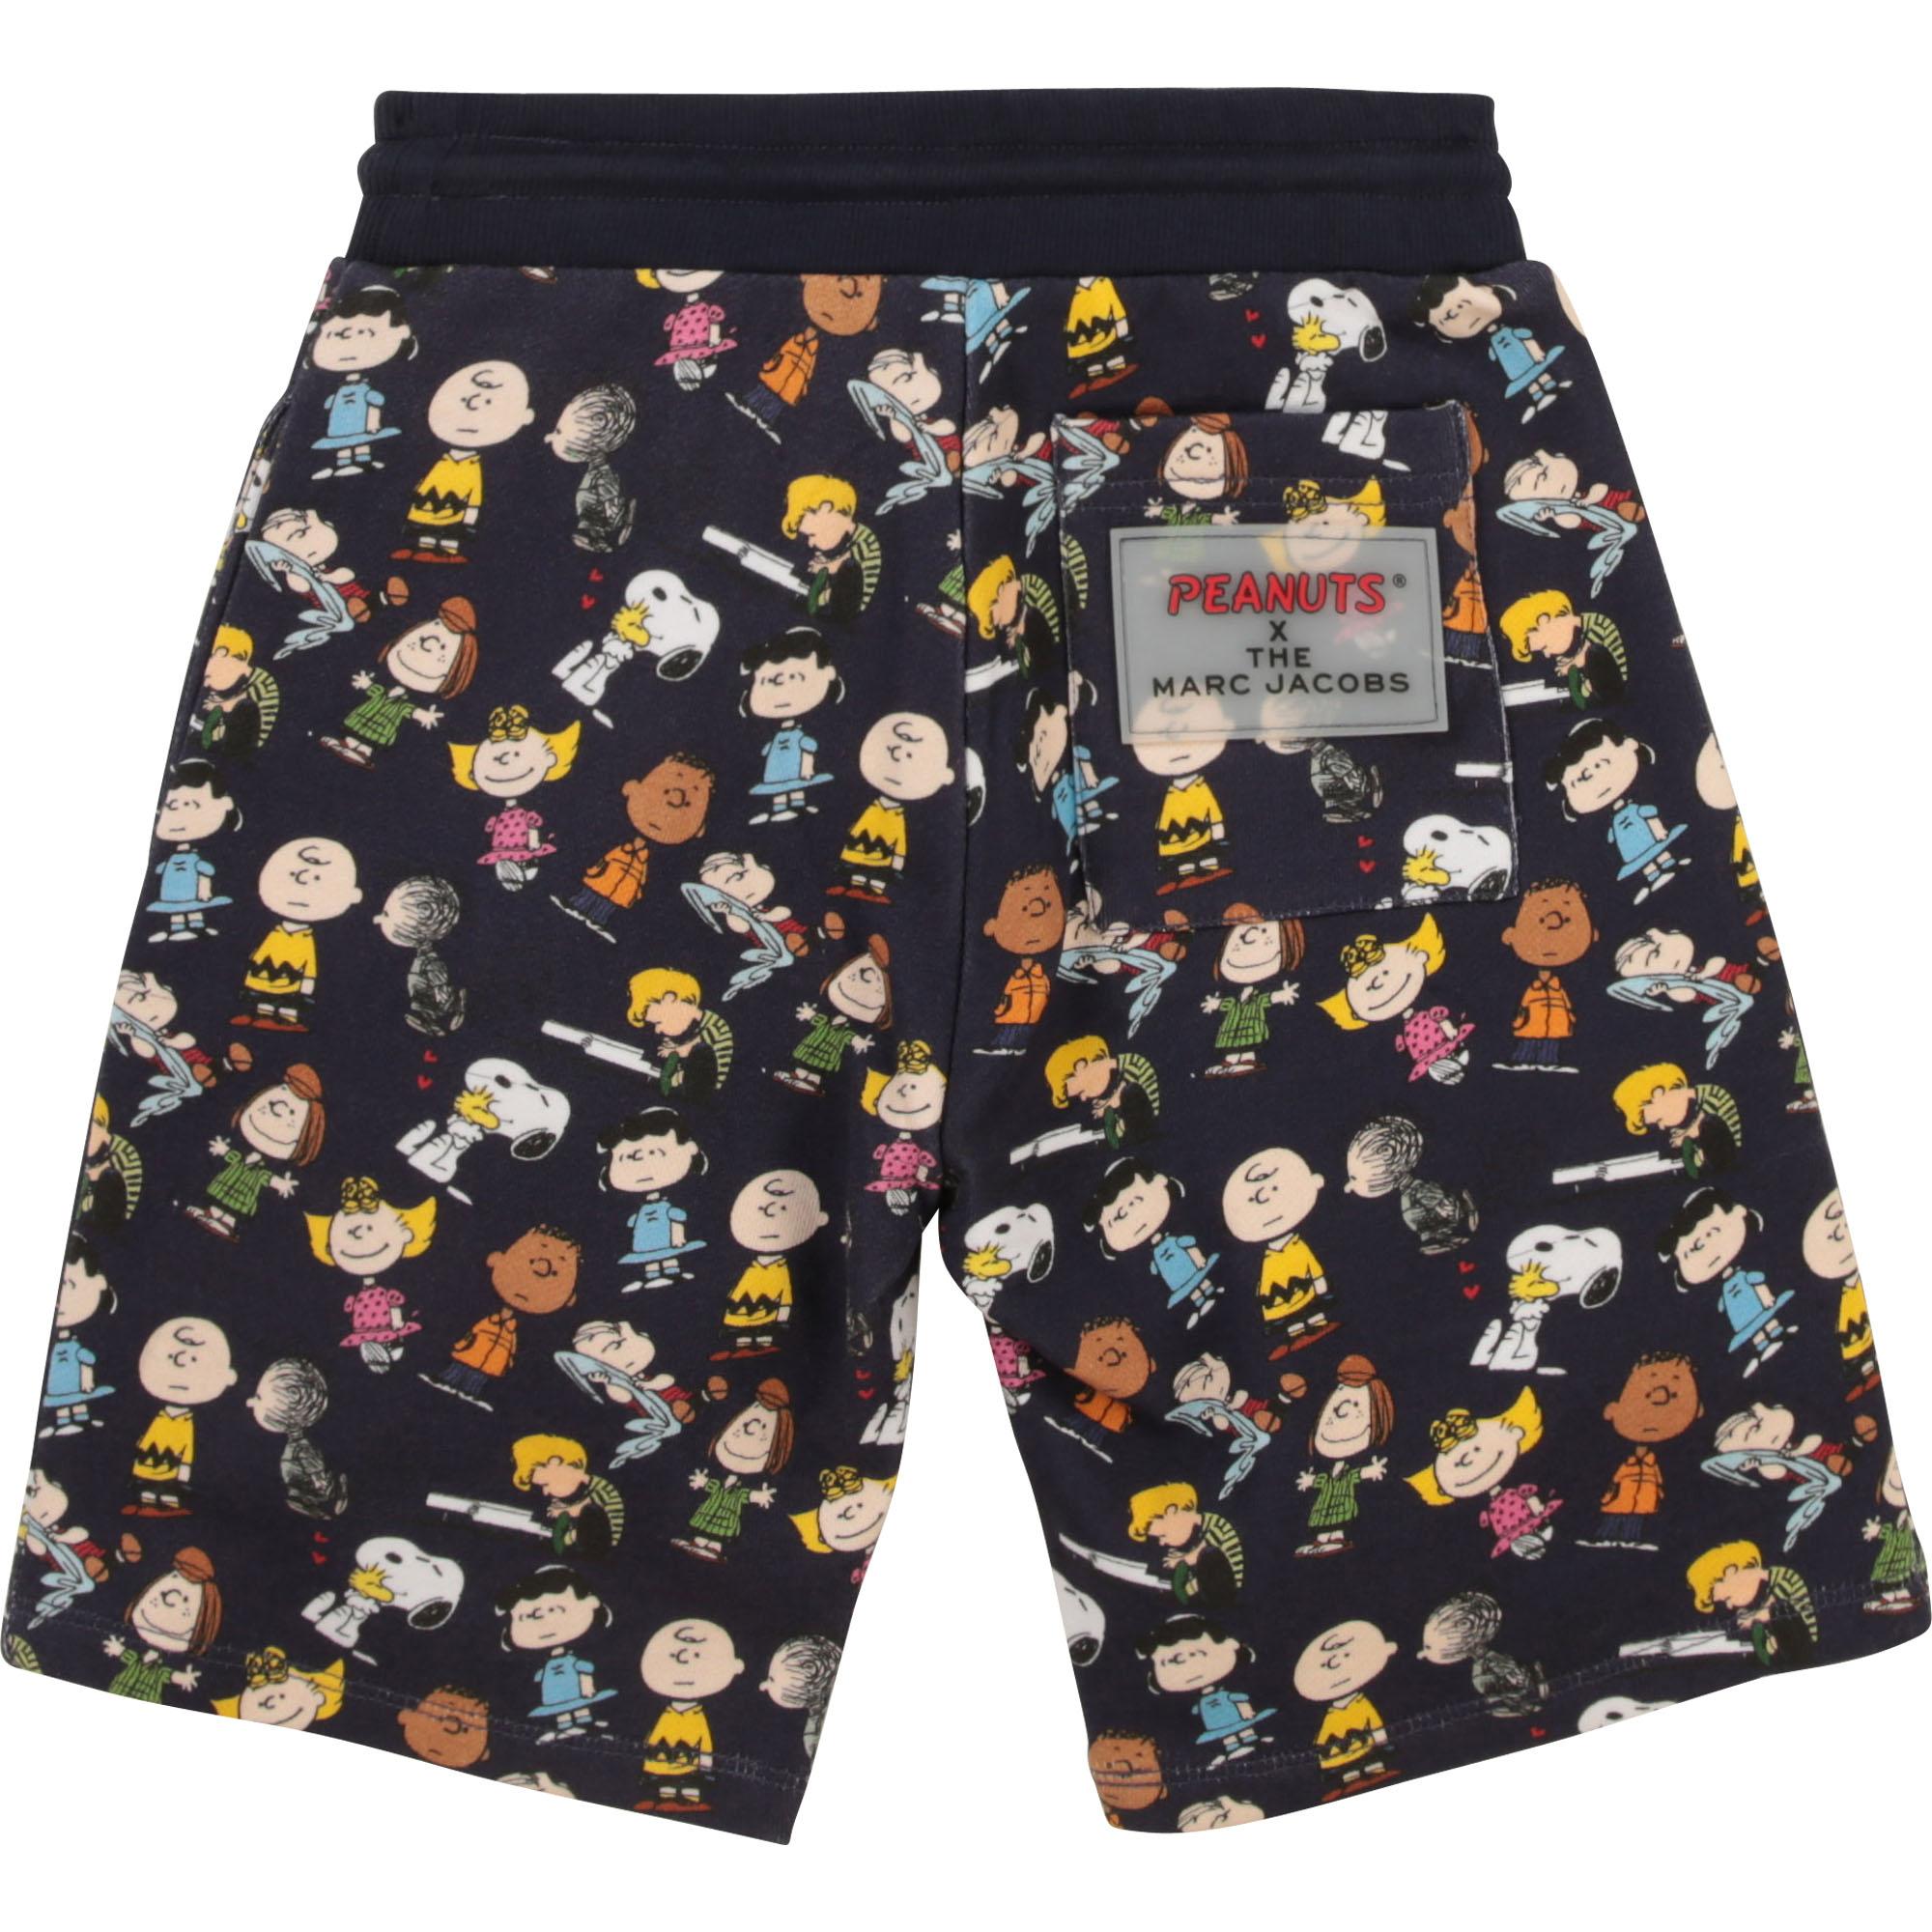 Cotton fleece shorts THE MARC JACOBS for BOY